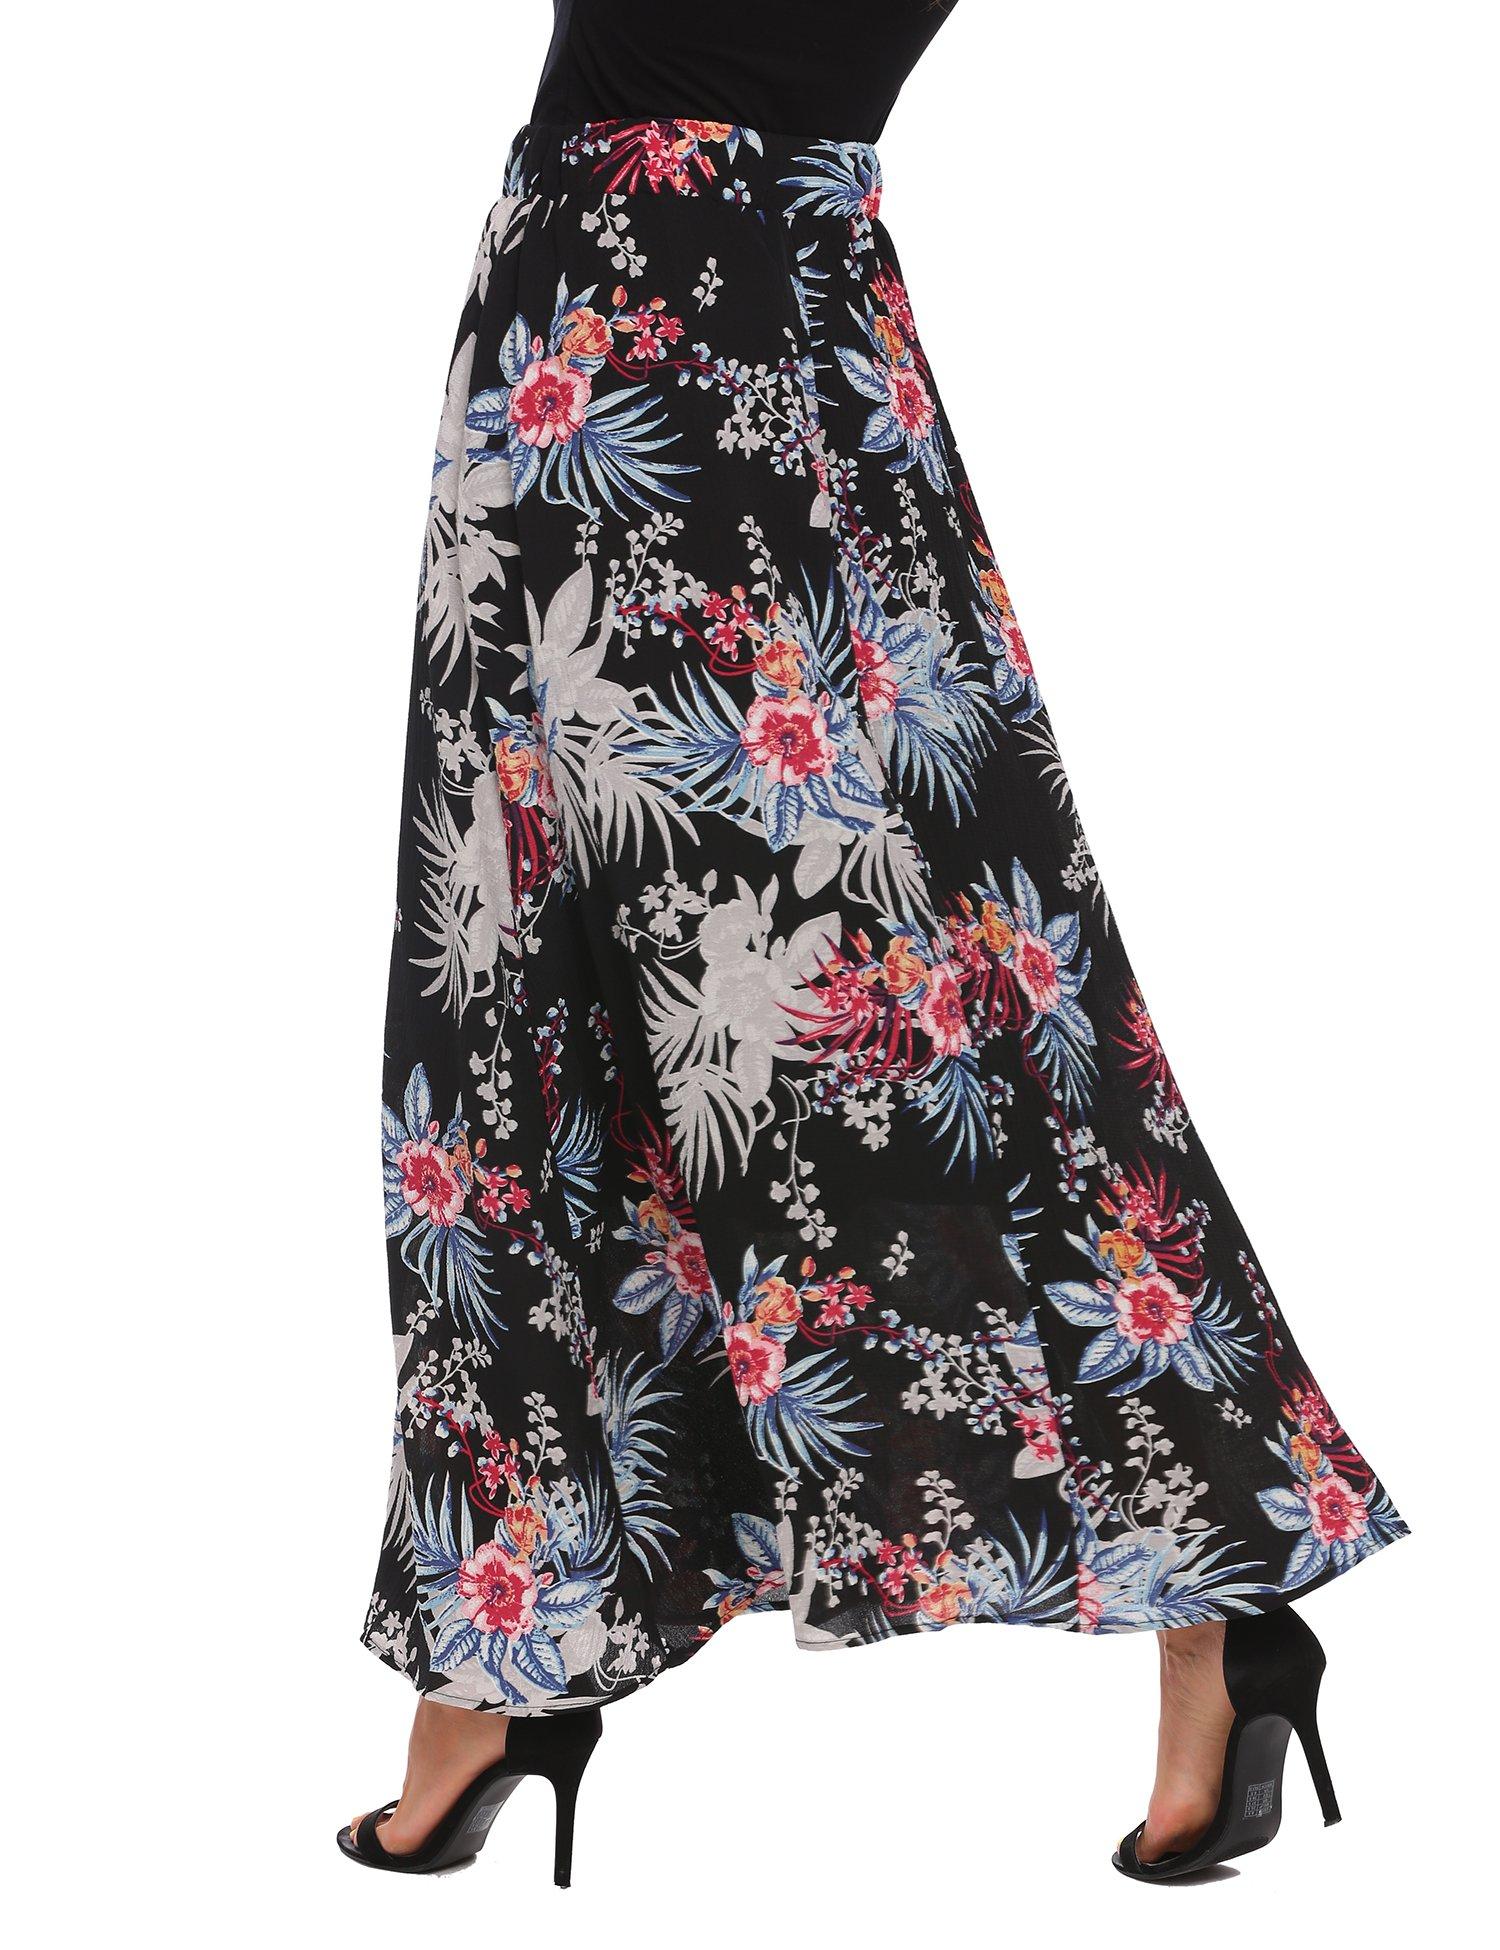 Zeagoo Women African Boho Floral Print High Waist Beach Party Bohemia Long Maxi Skirt,Black,X-Large